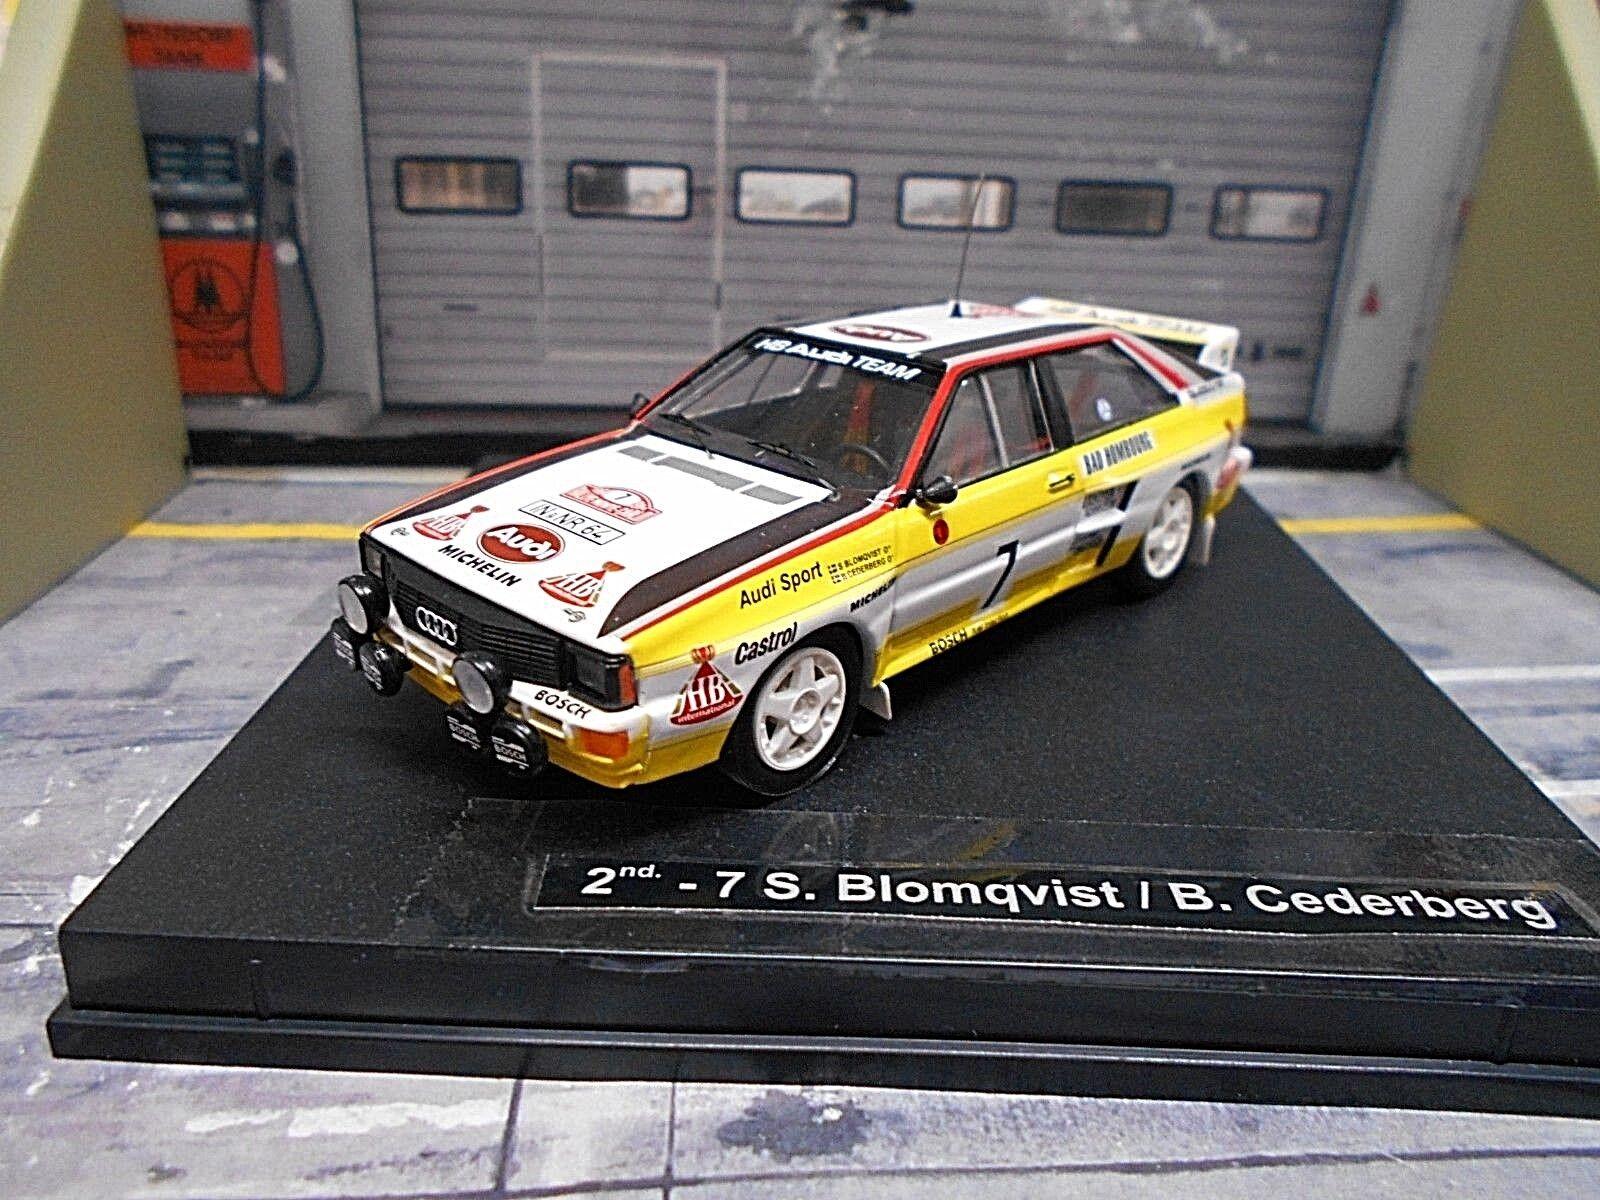 AUDI QUATTRO RALLYE MONTE CARLO Taille B 1984  7 Blomqvist Transformation HB Trofeu 1 43